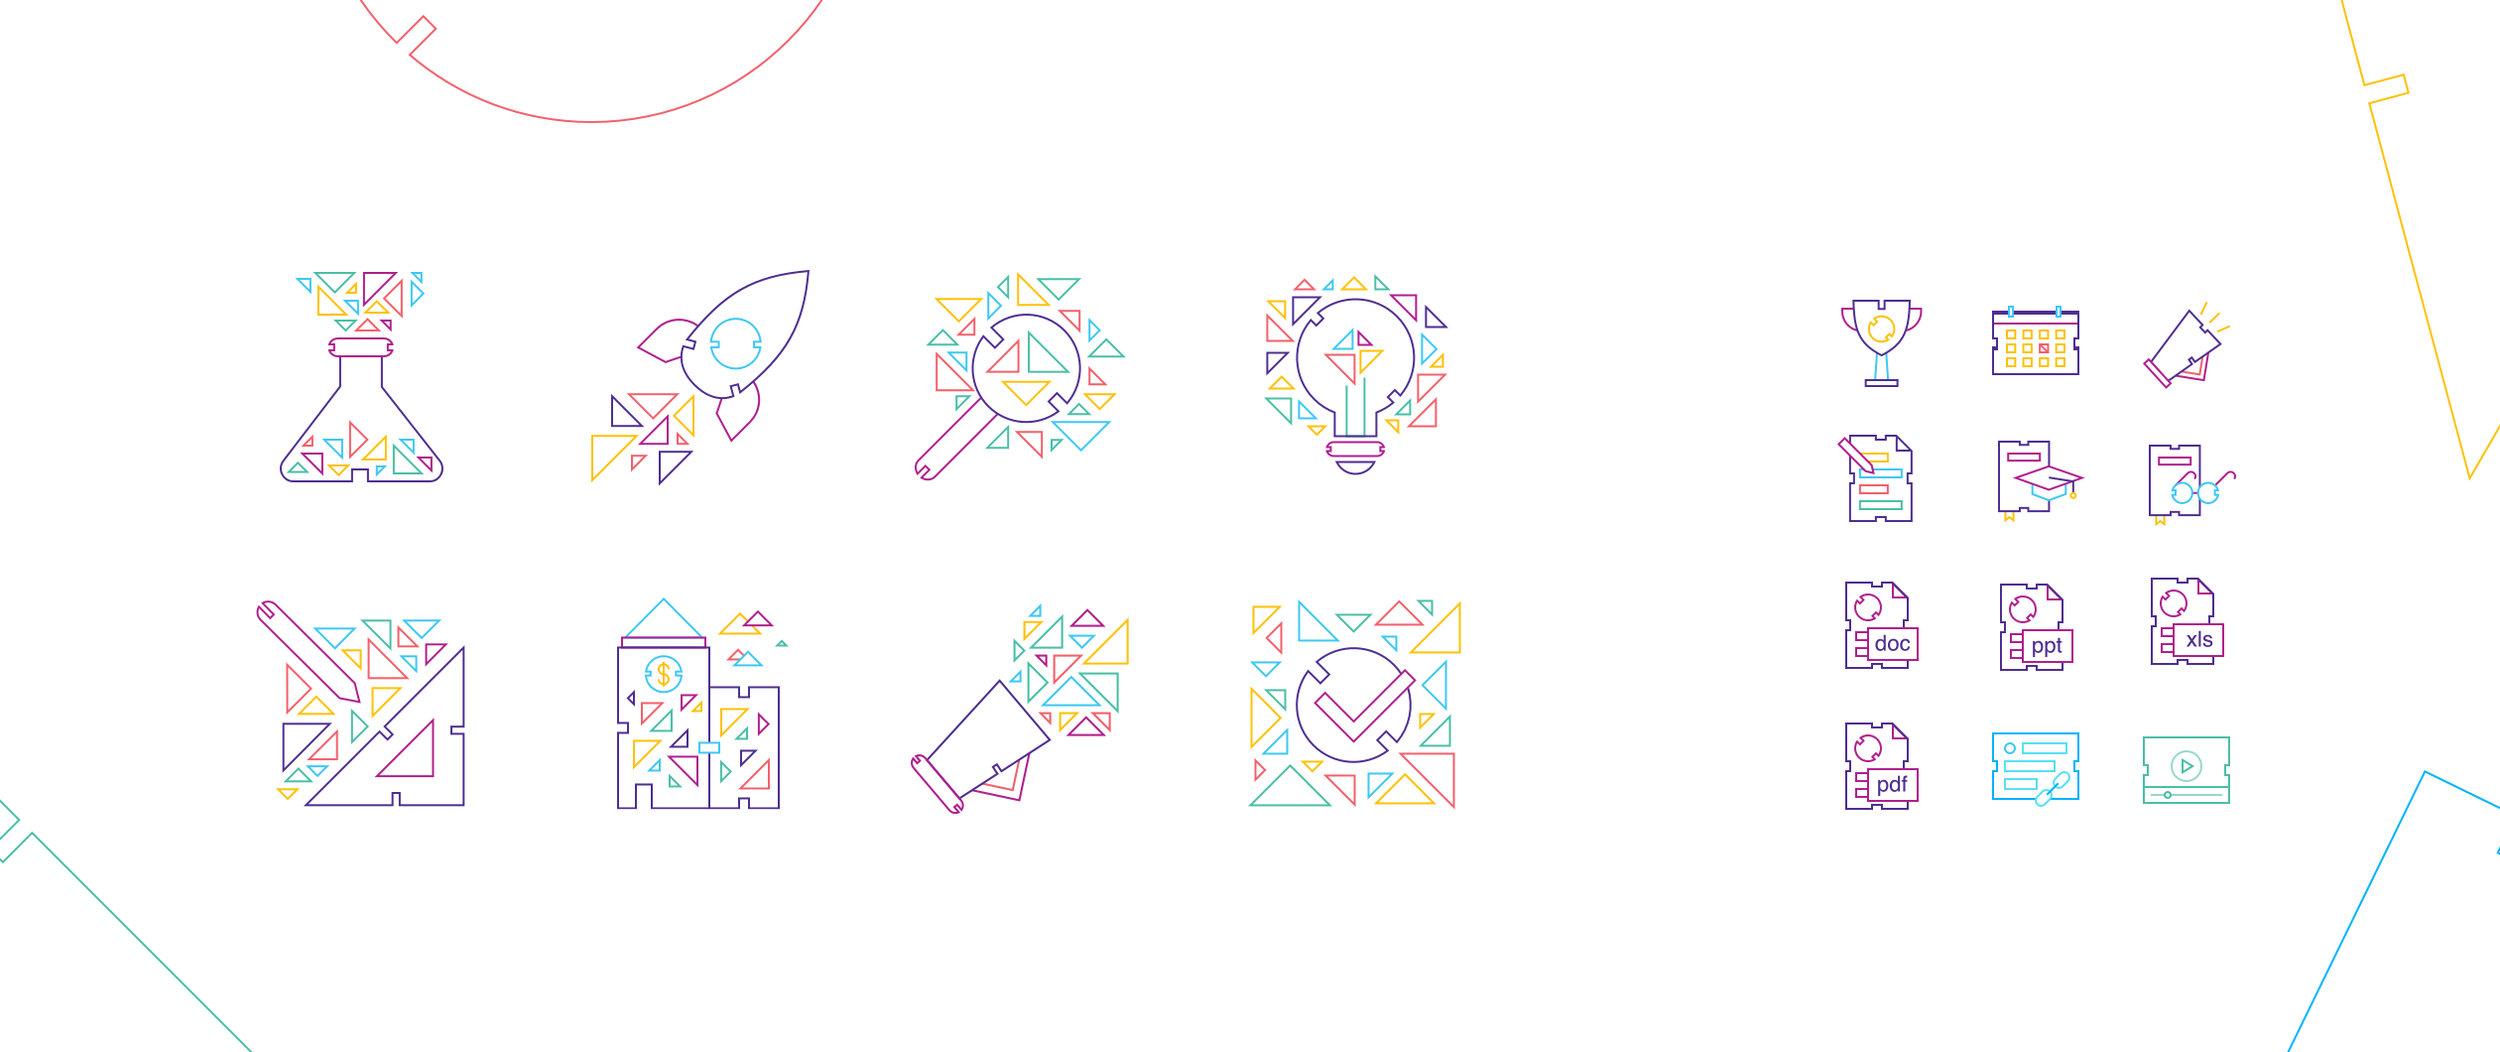 port-img-02_design-ventura@2x.jpg